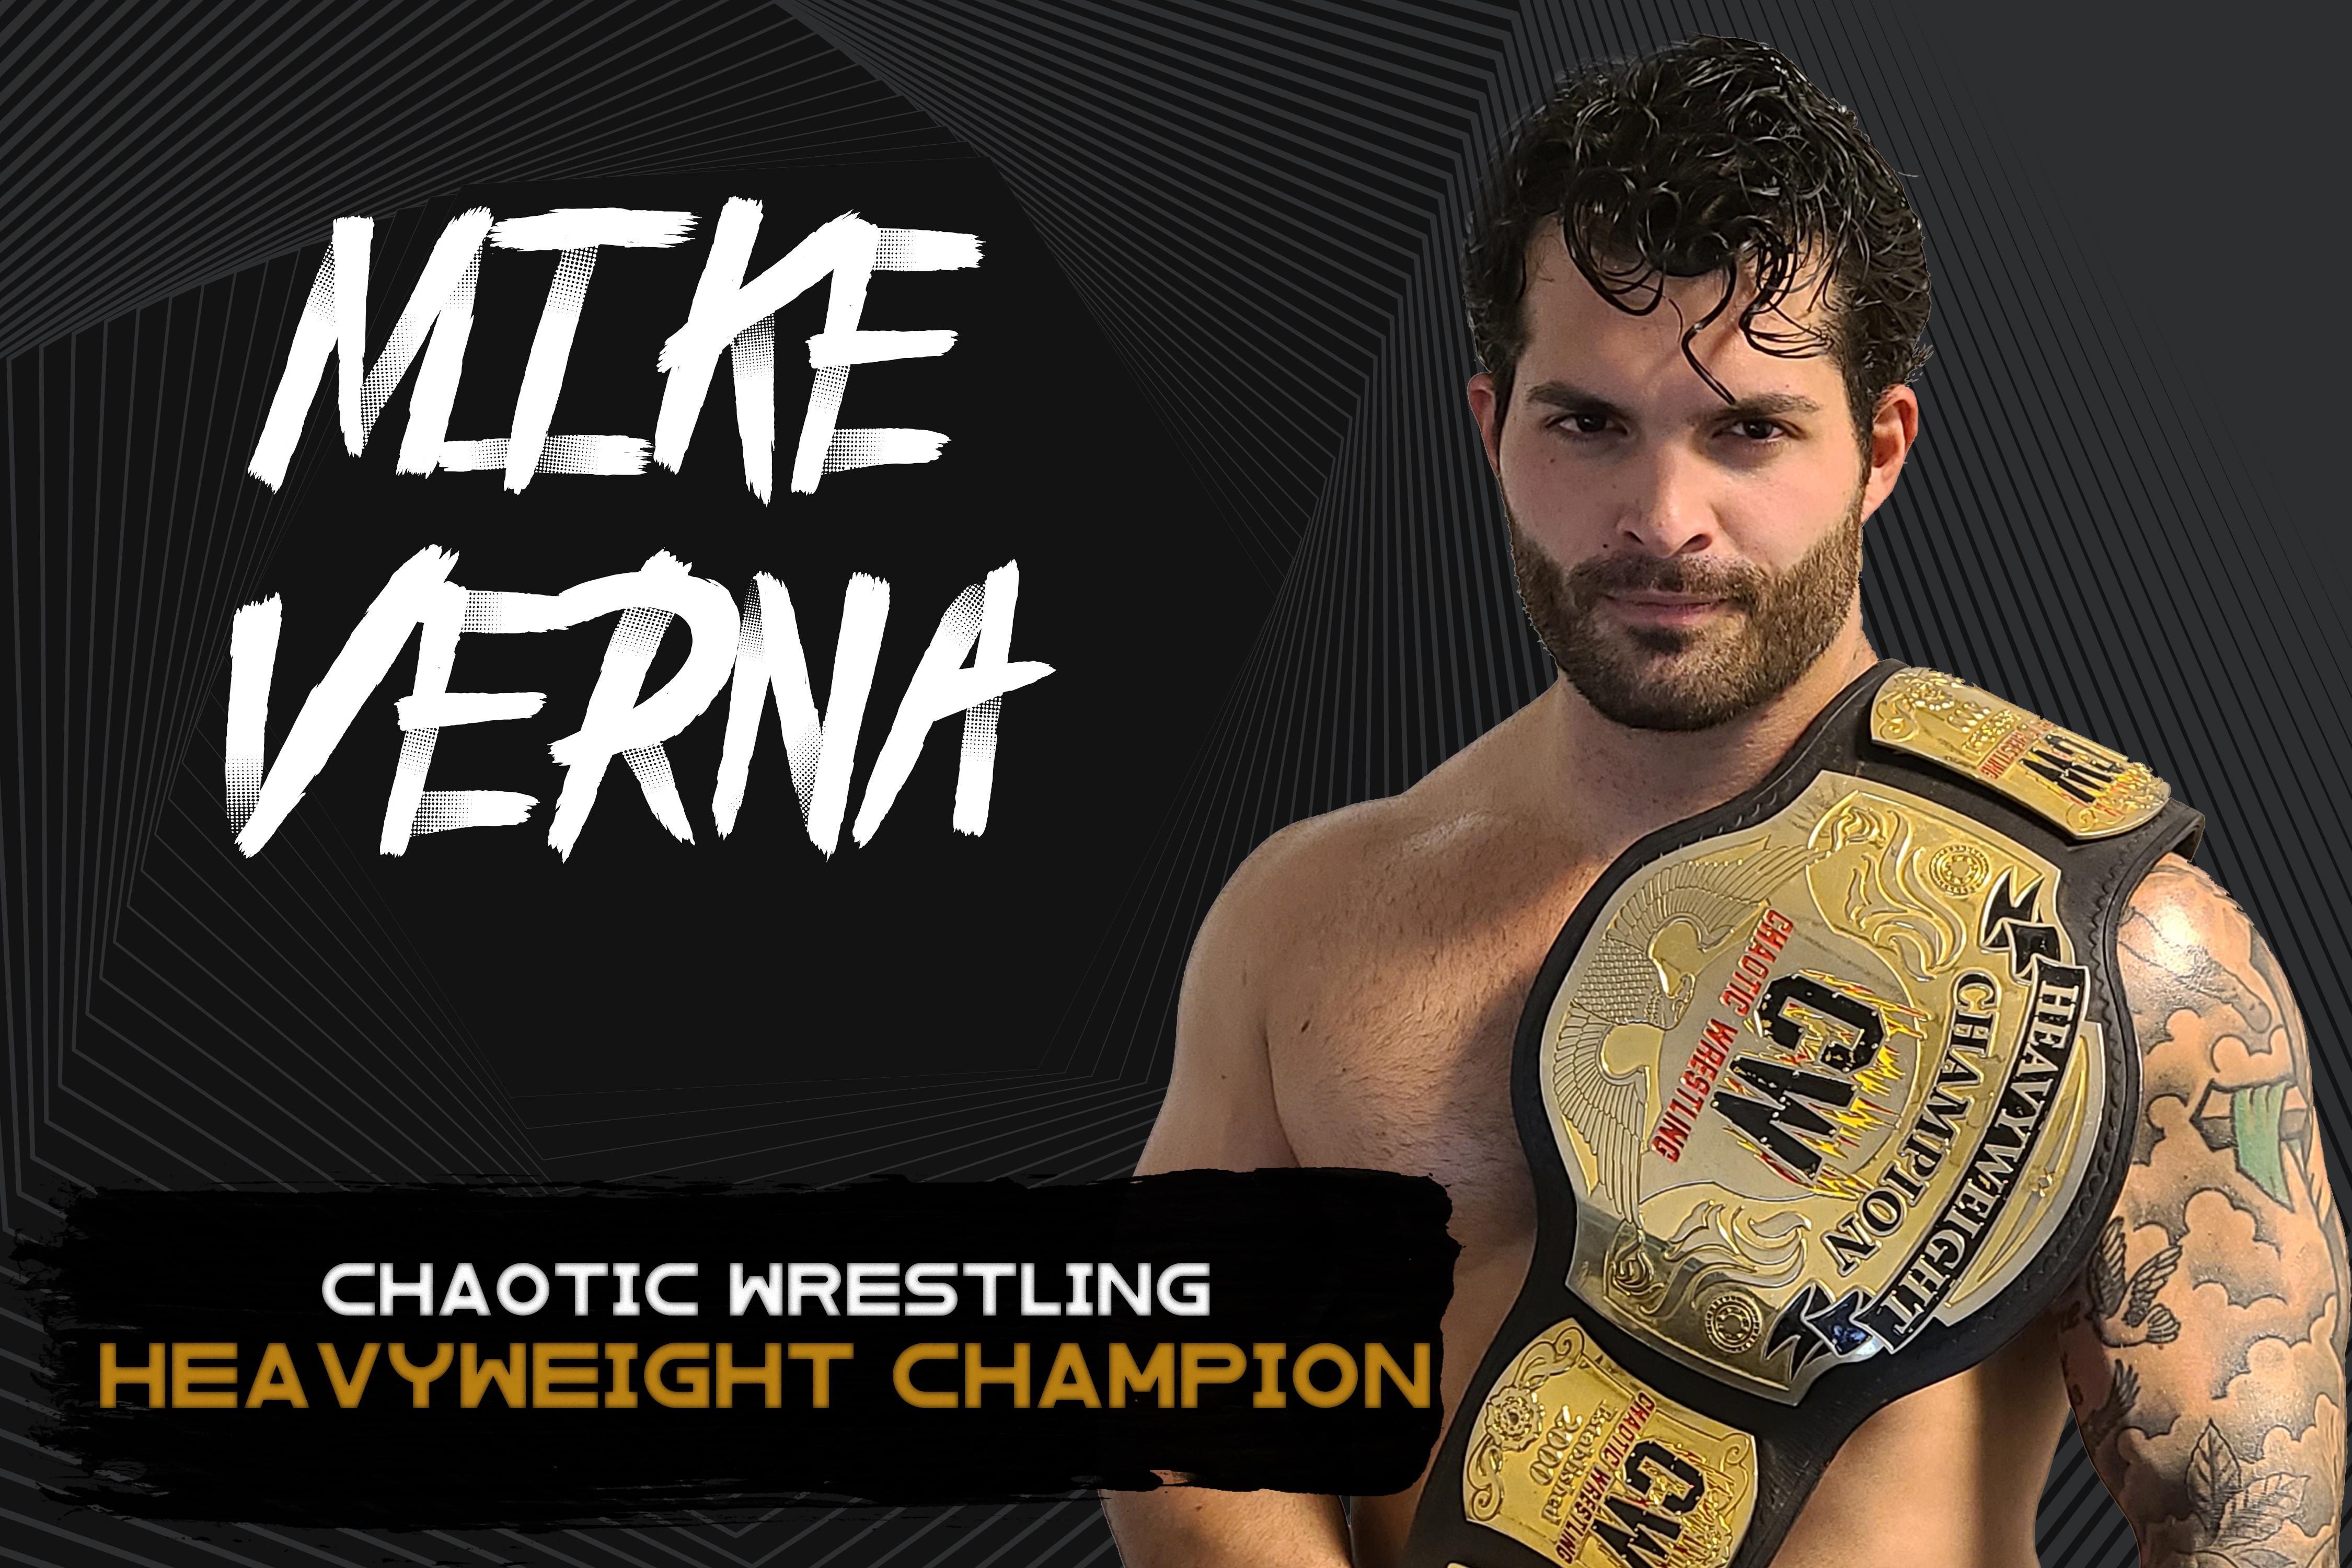 Mike Verna Heavyweight Champ